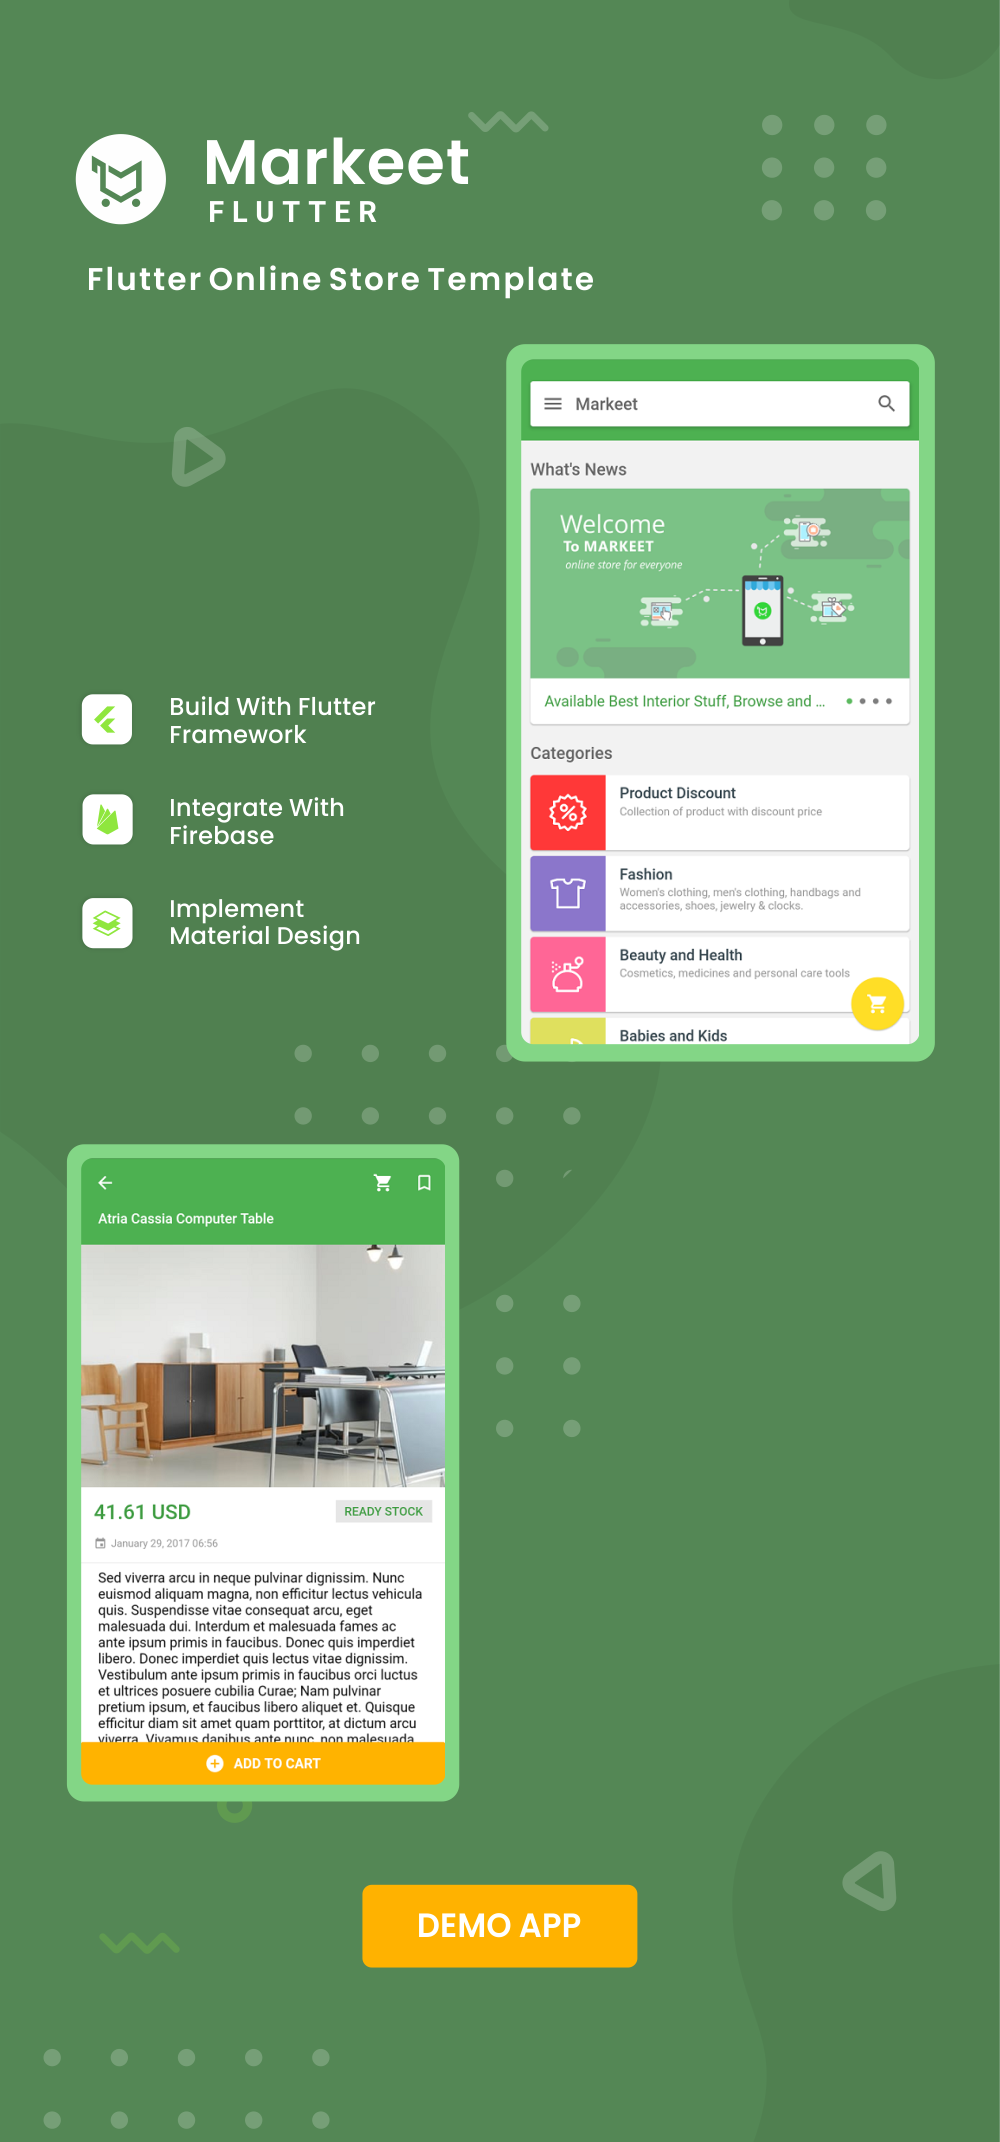 Markeet Flutter - Ecommerce Flutter App 2.0 - 3